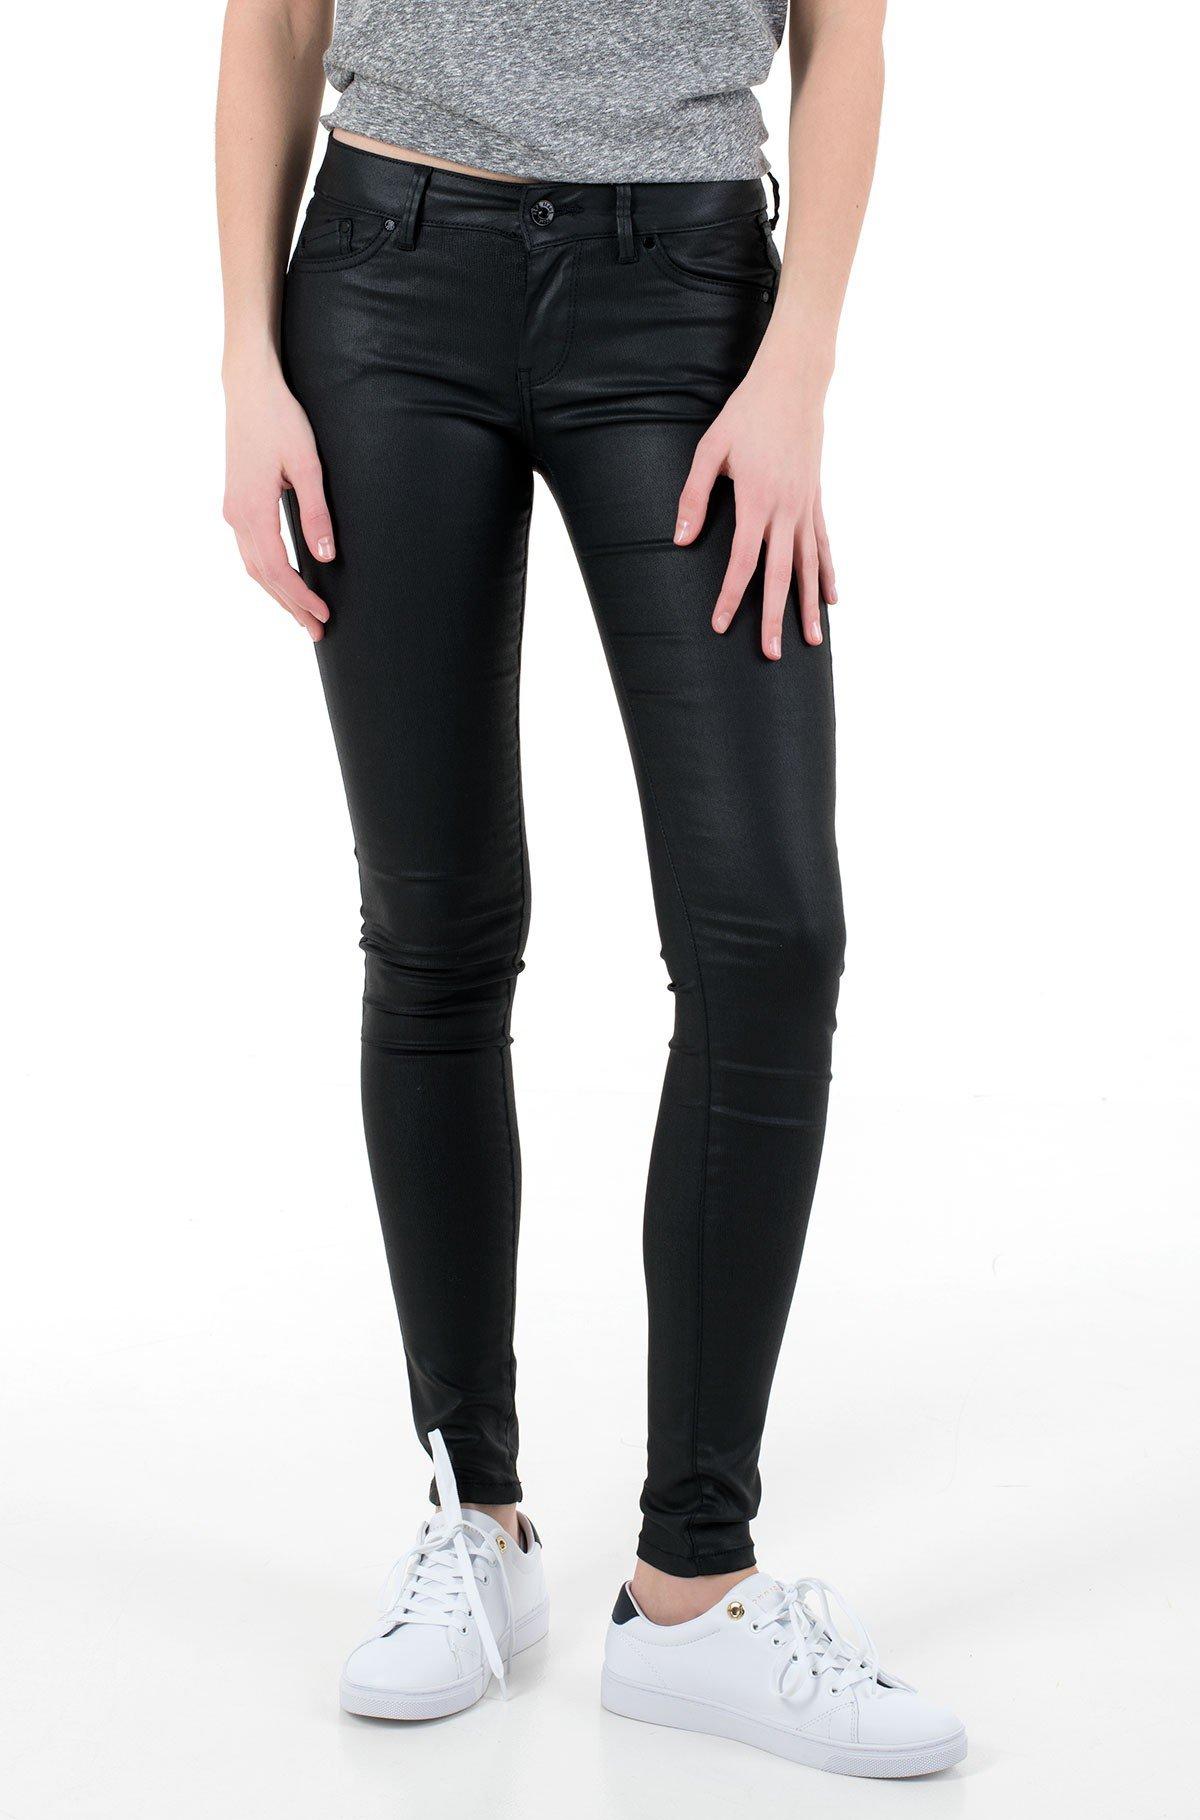 Trousers PIXIE/PL200025XB0-full-1